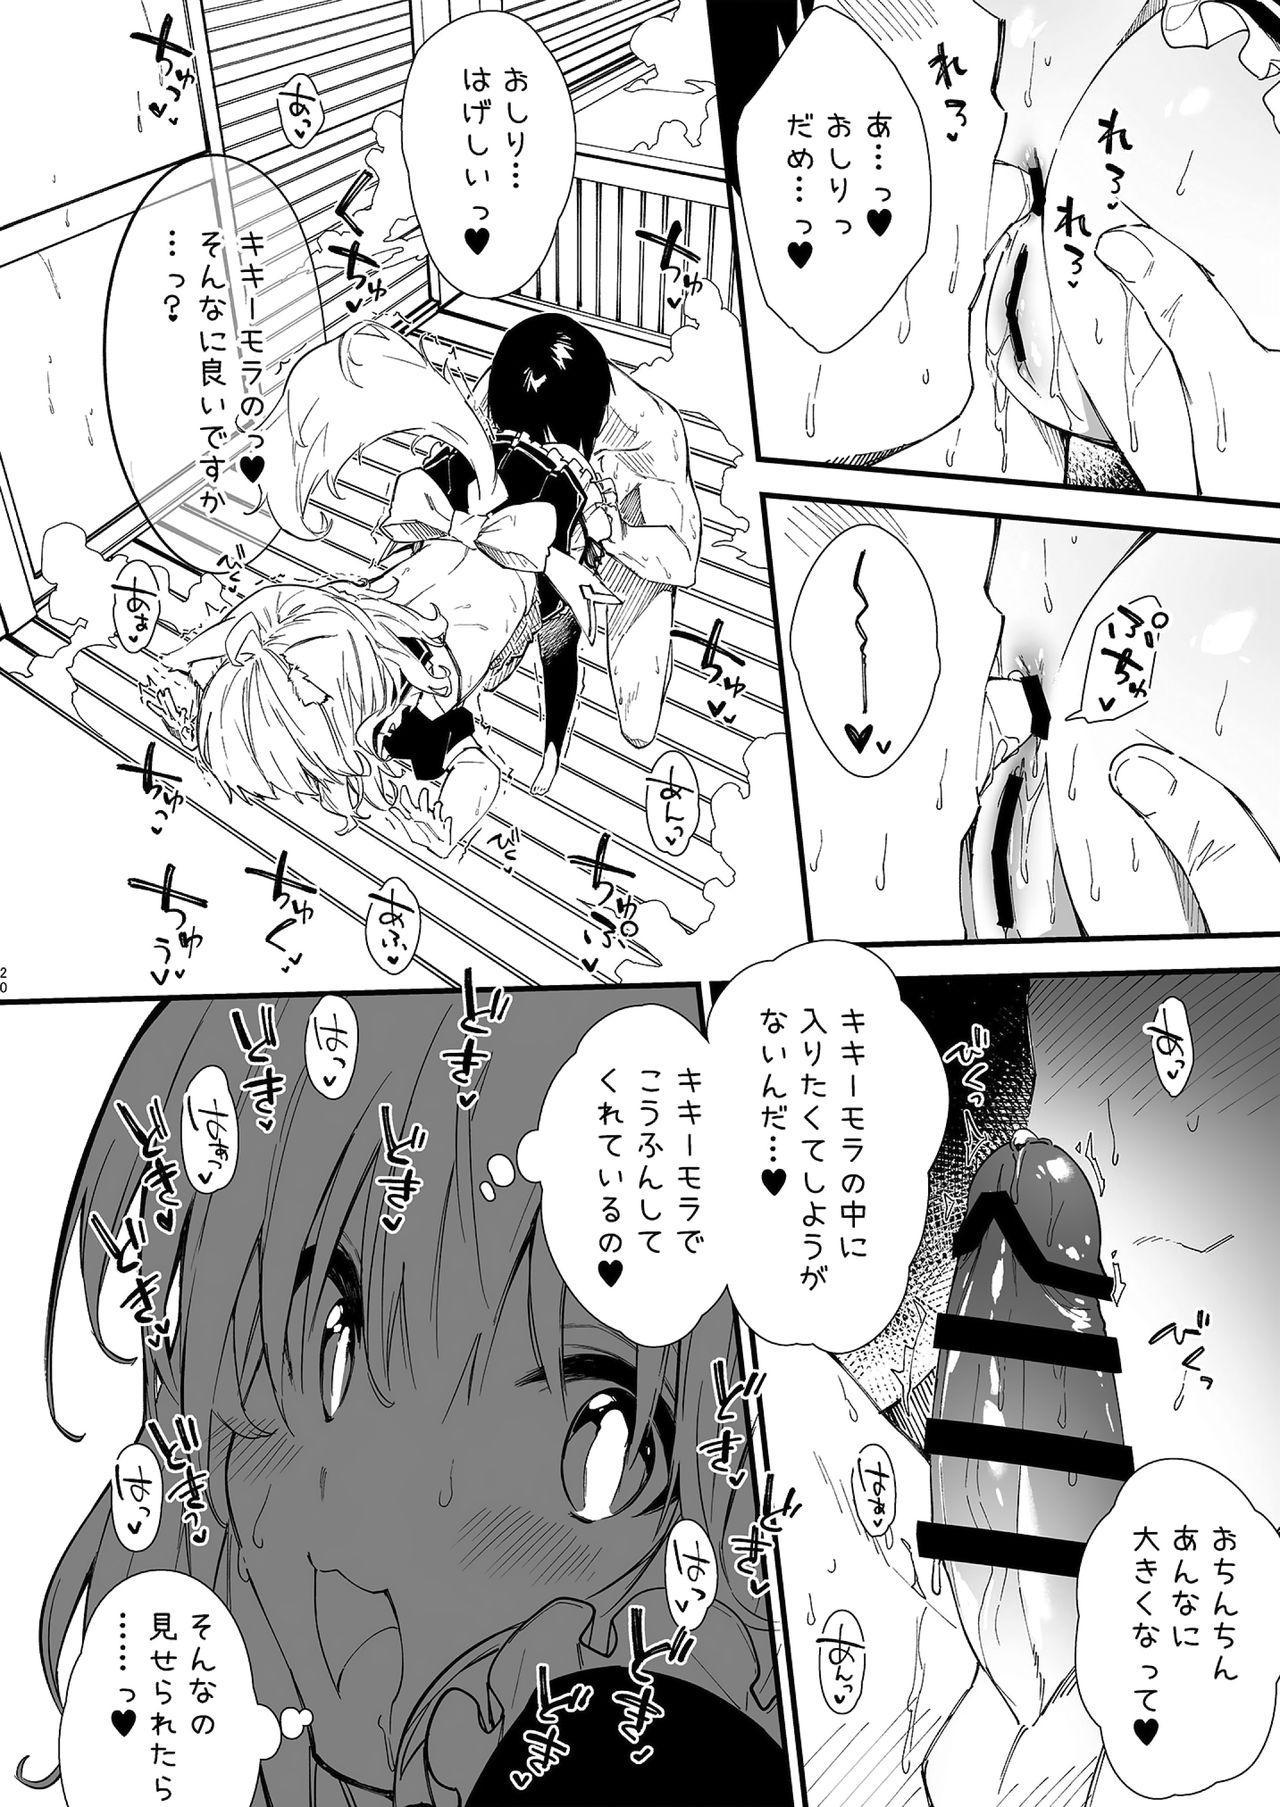 Kemomimi Maid to Ichaicha suru Hon 17